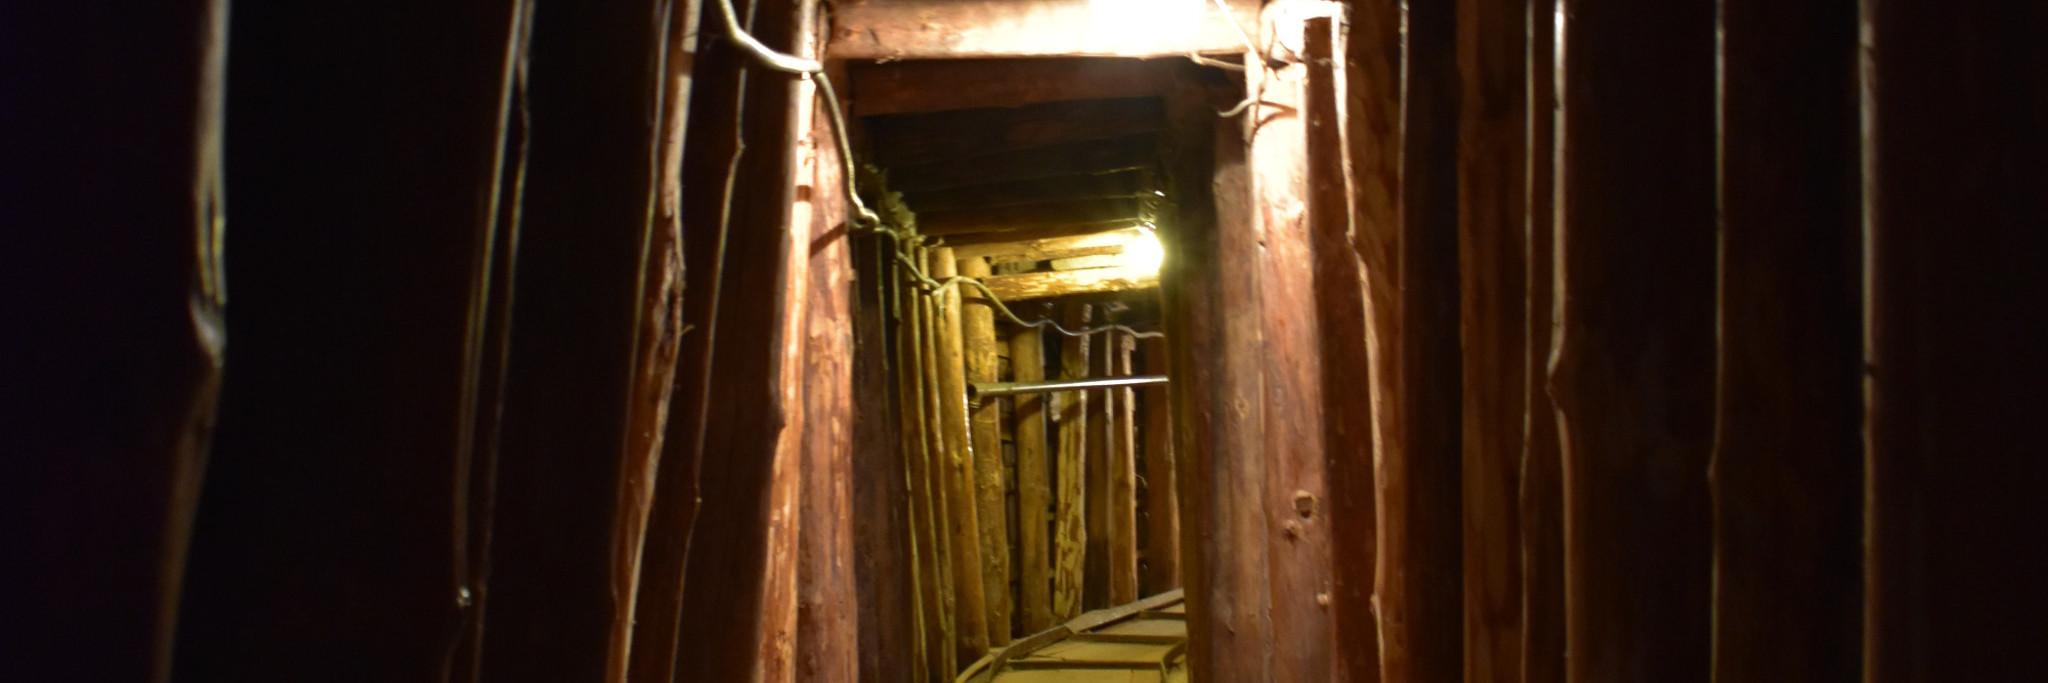 Туннель спасения. Фото: Justin W Flory, CC-BY-SA 4.0